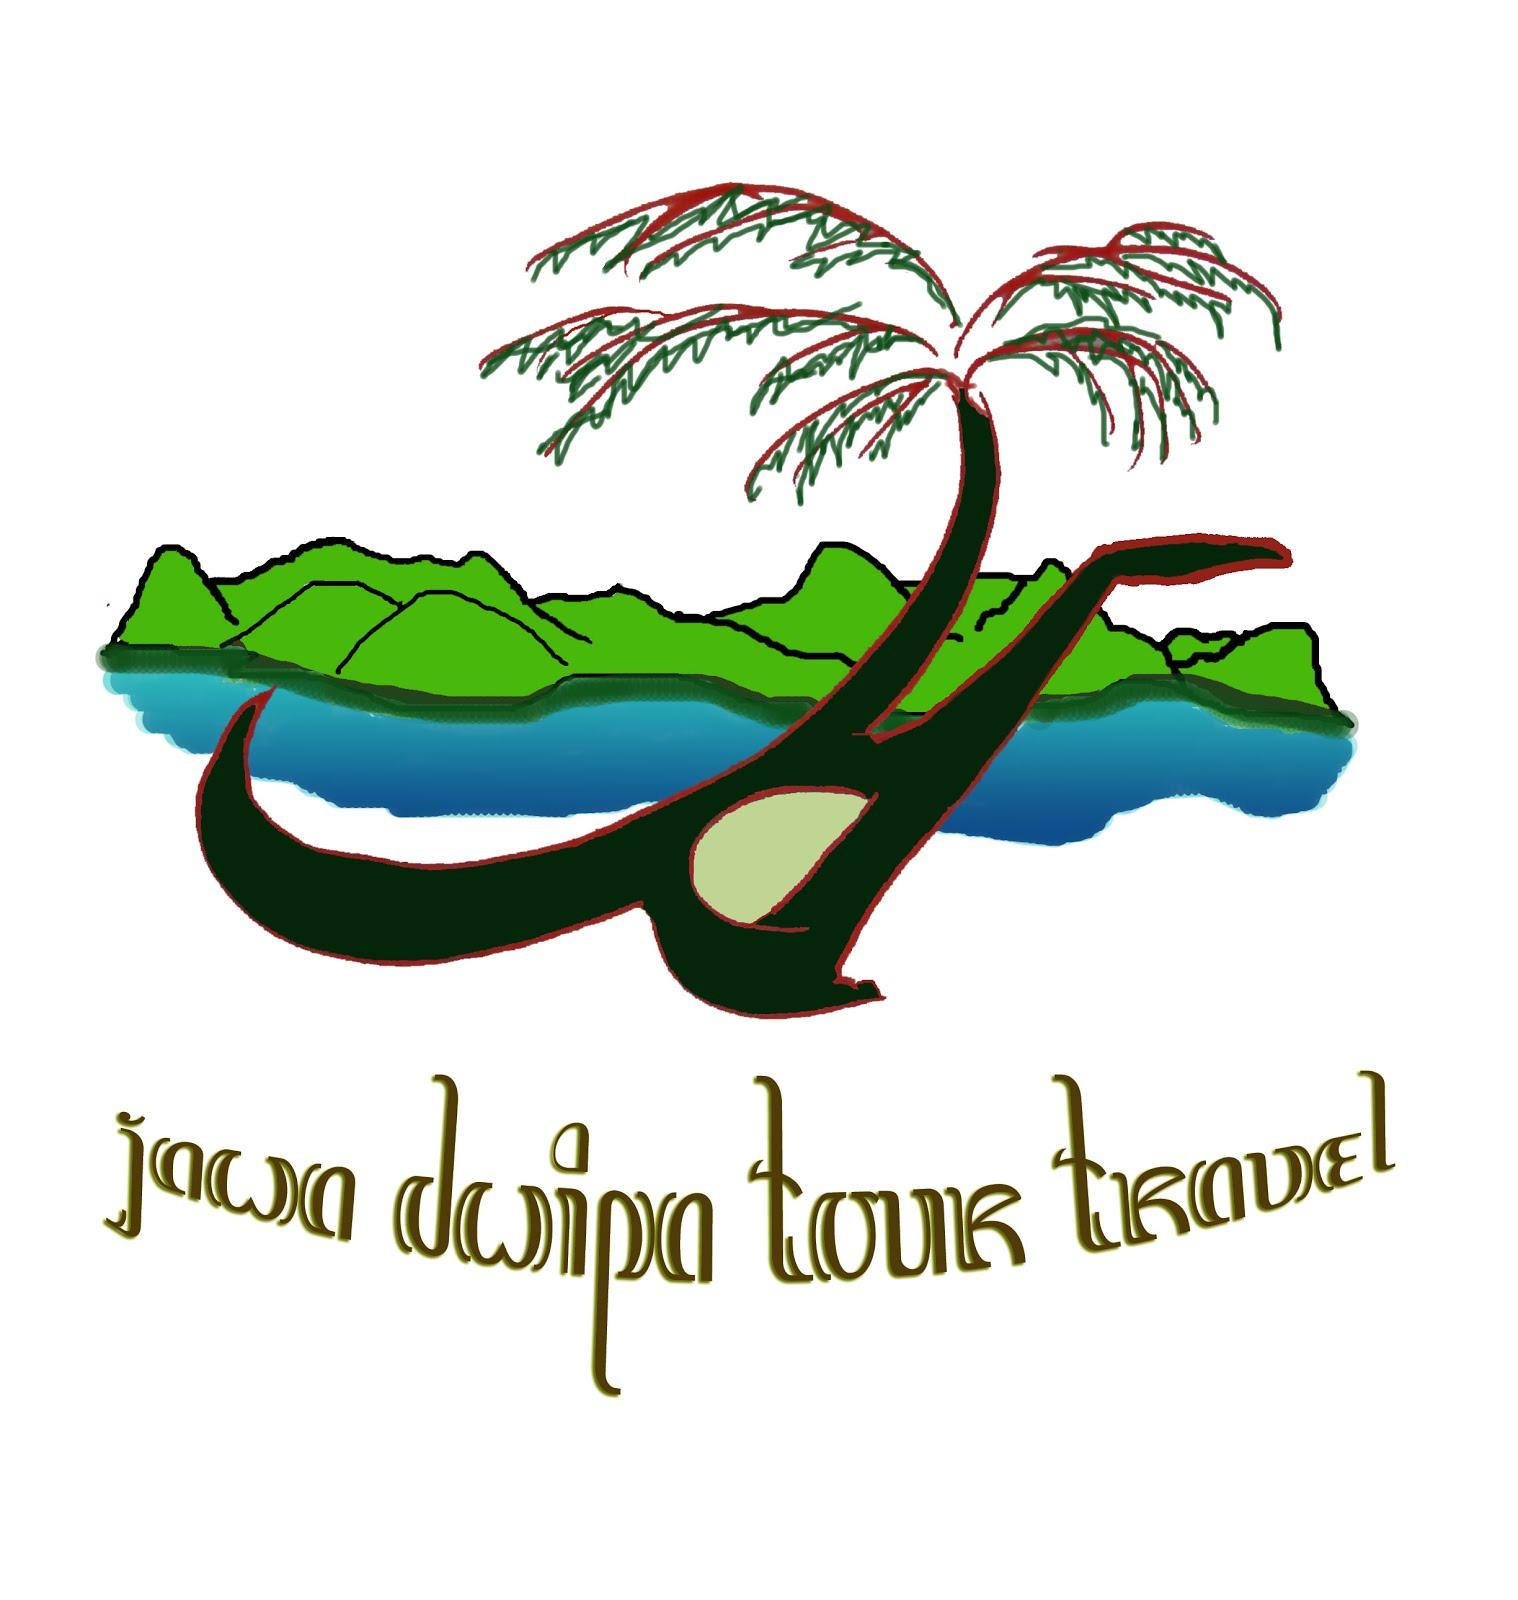 JDT (Jawa Dwipa Travel)